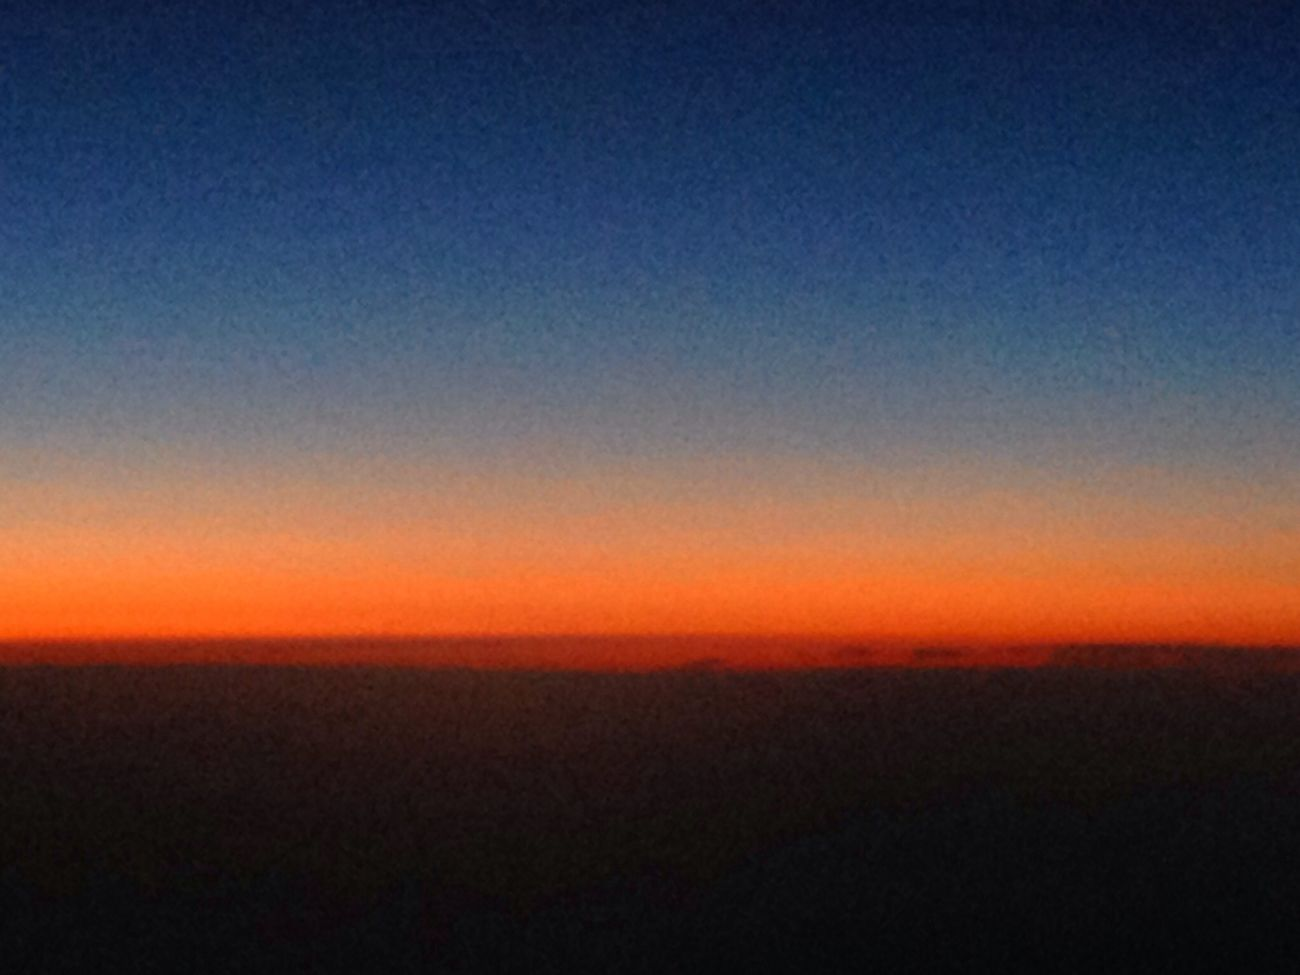 Sunset from 35k feet on Virgin Atlantic flight to Las Vegas